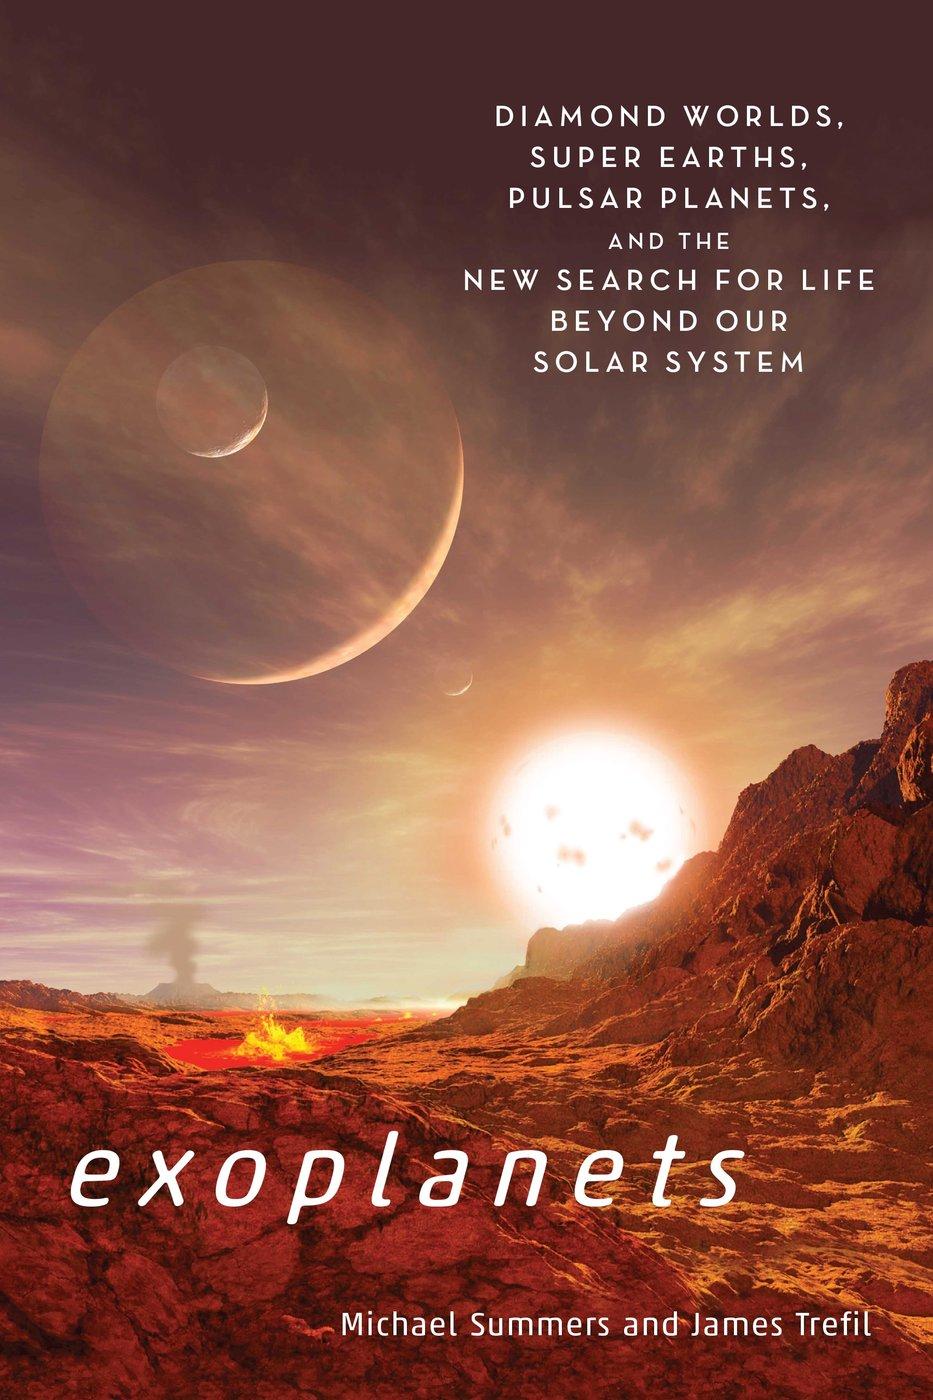 Exoplanets (Smithsonian Books, 2017)